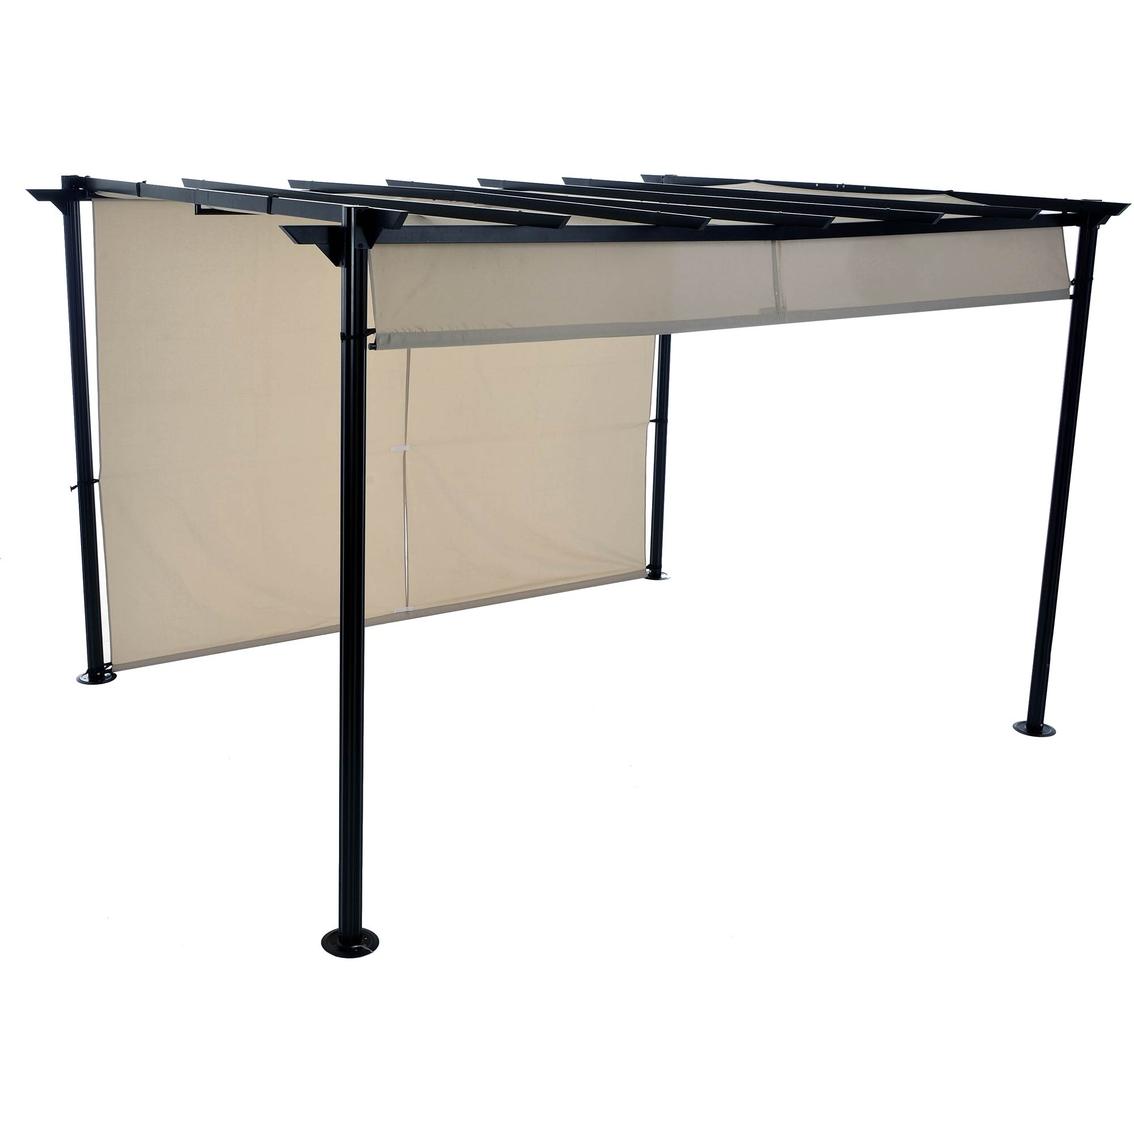 Steel pergola with retractable canopy